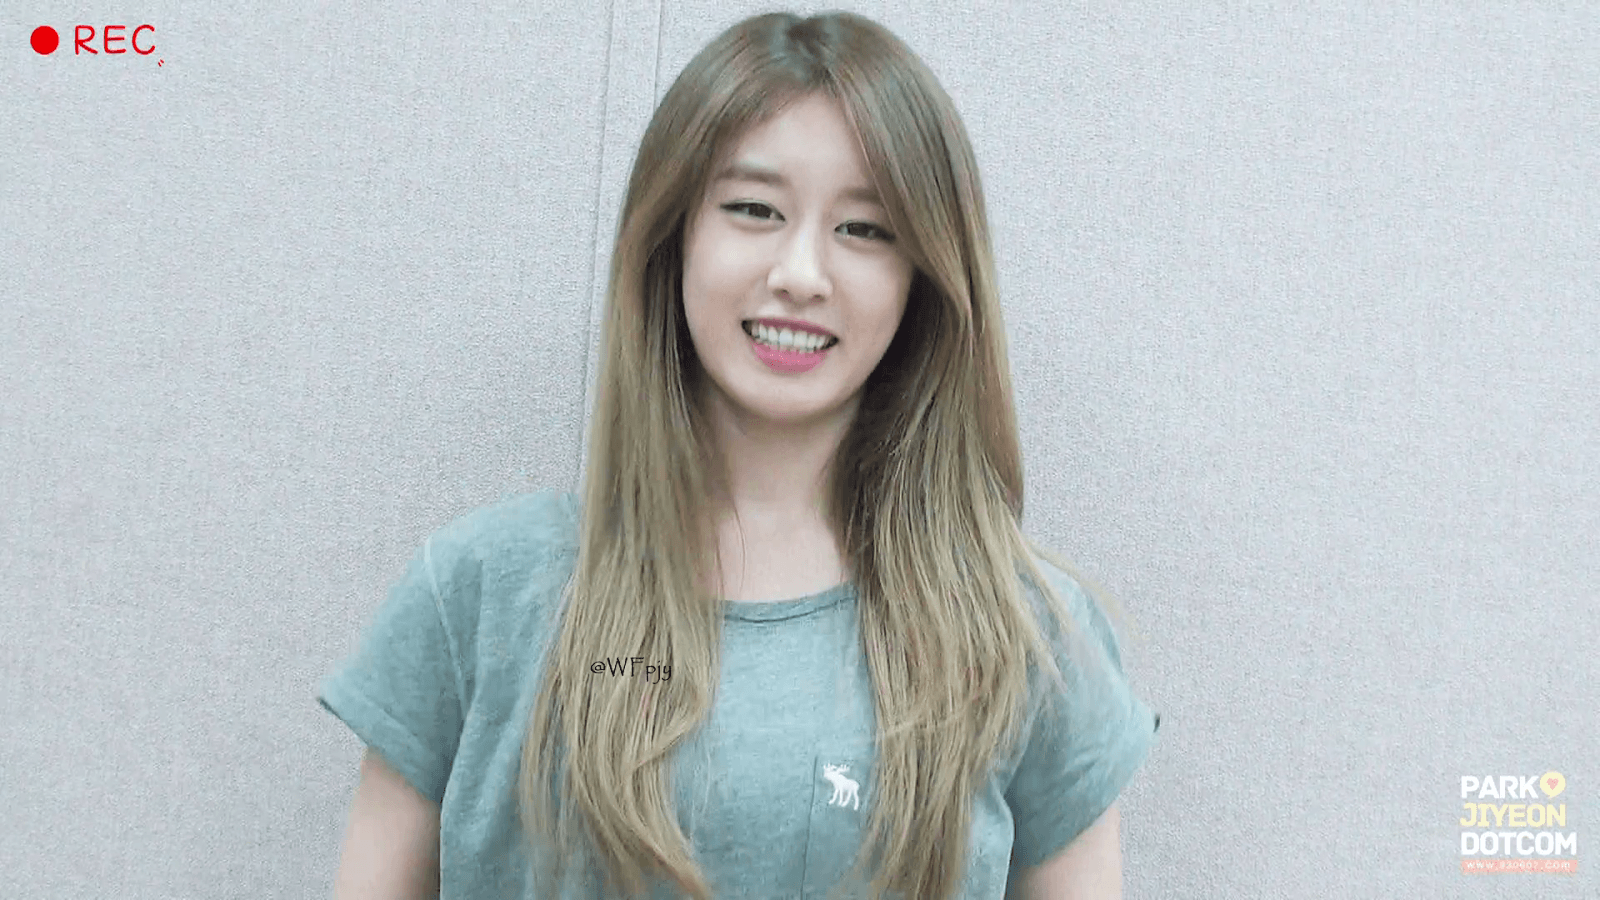 Jiyeon Wallpapers - Top Free Jiyeon Backgrounds